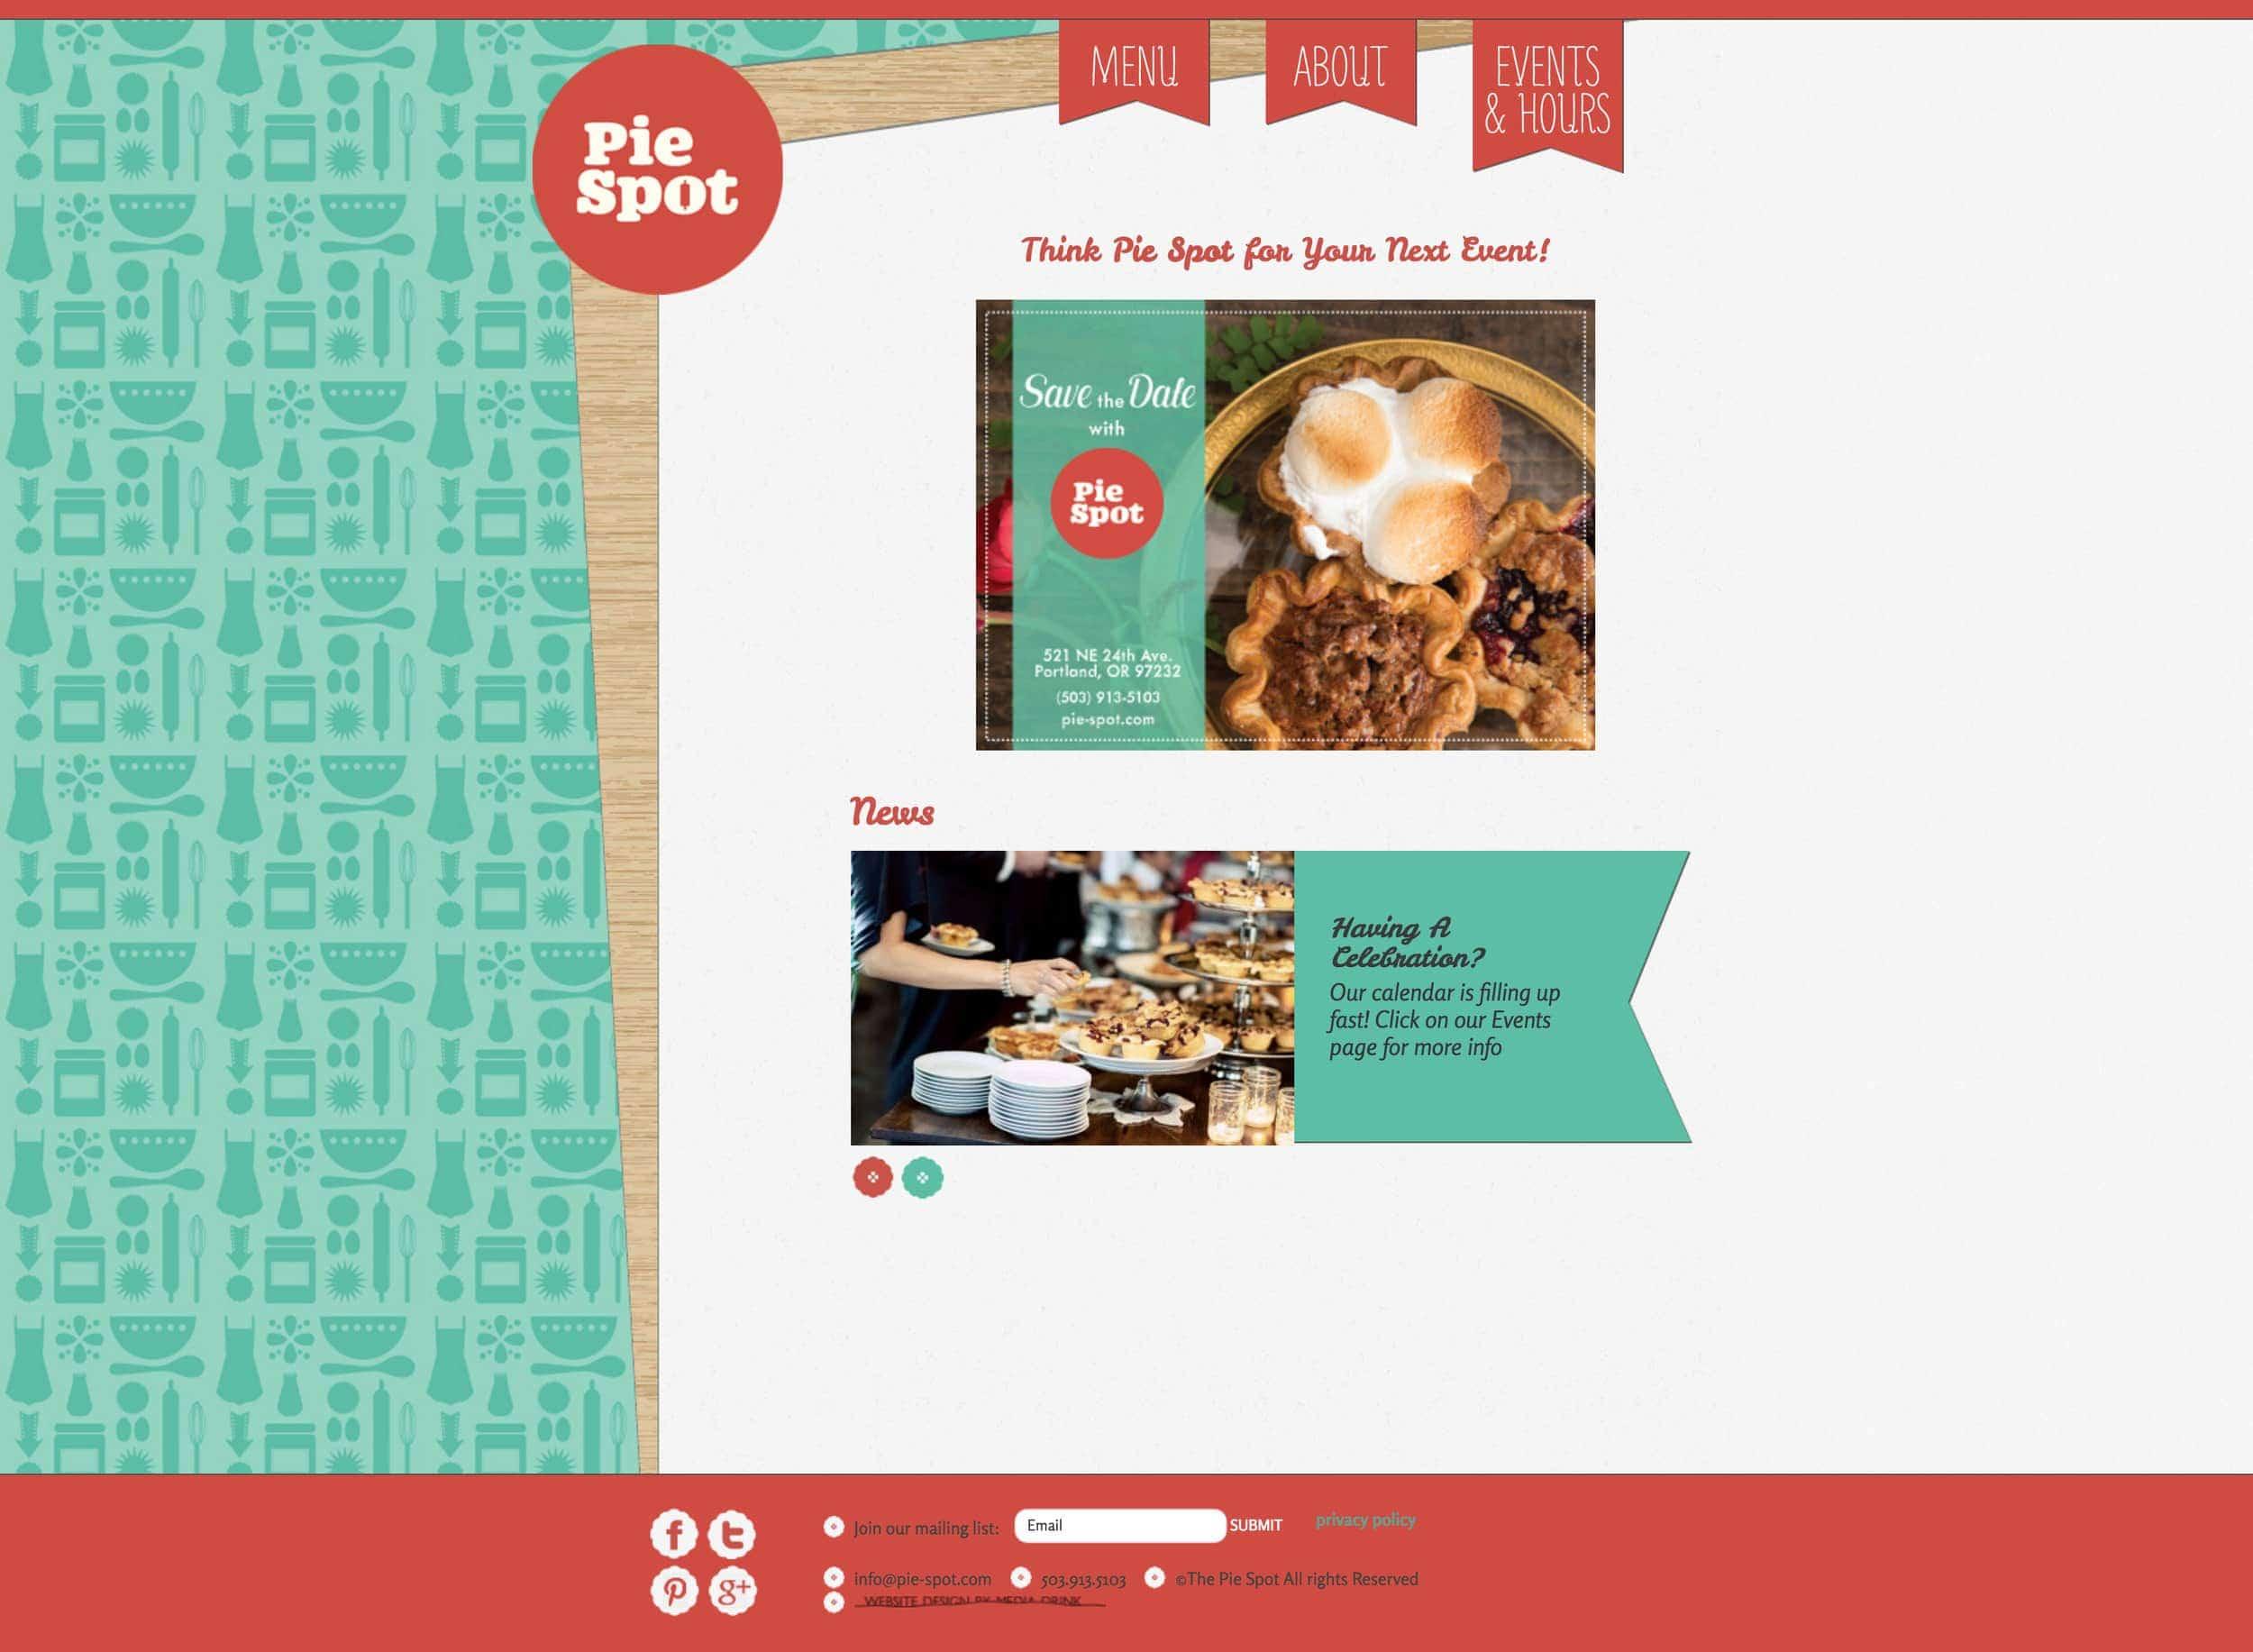 The original Pie Spot website. It was fun, but hard to update.